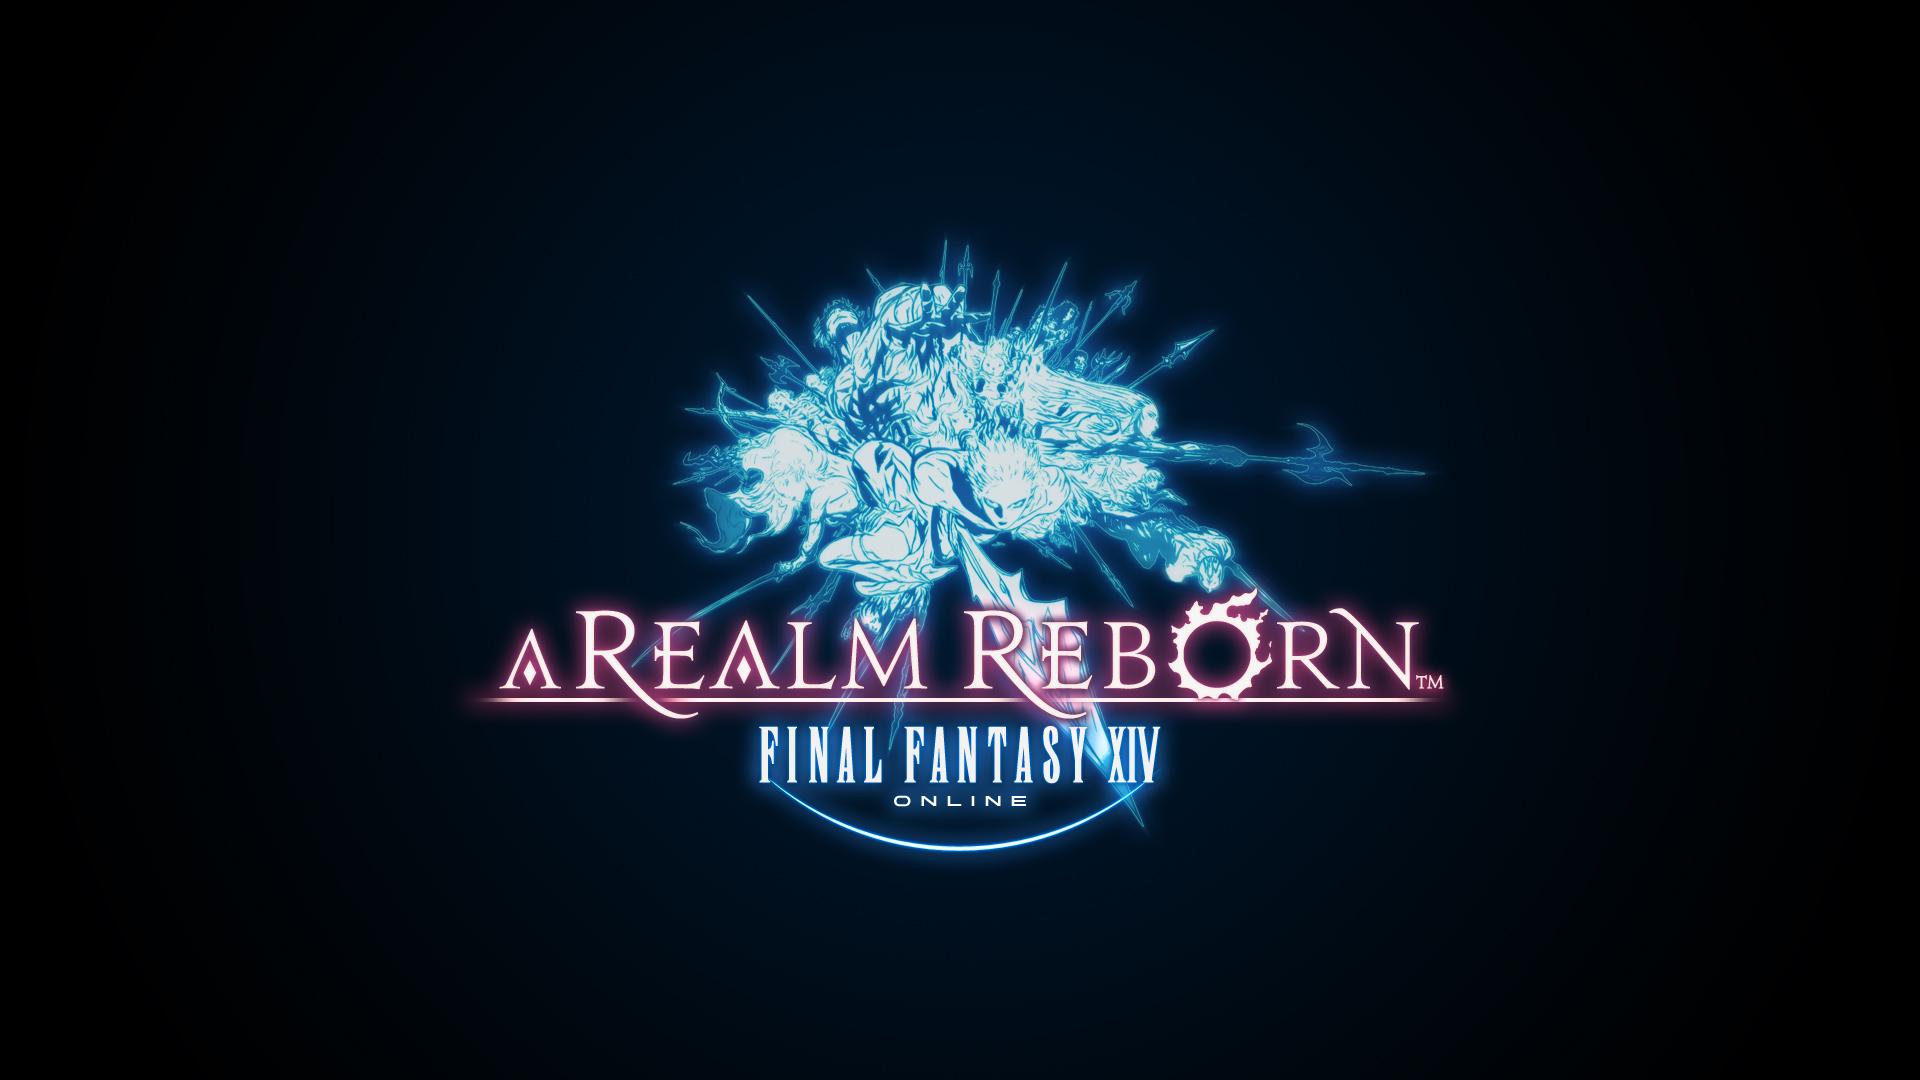 Final Fantasy XIV A Realm Rebornjpg 1920x1080